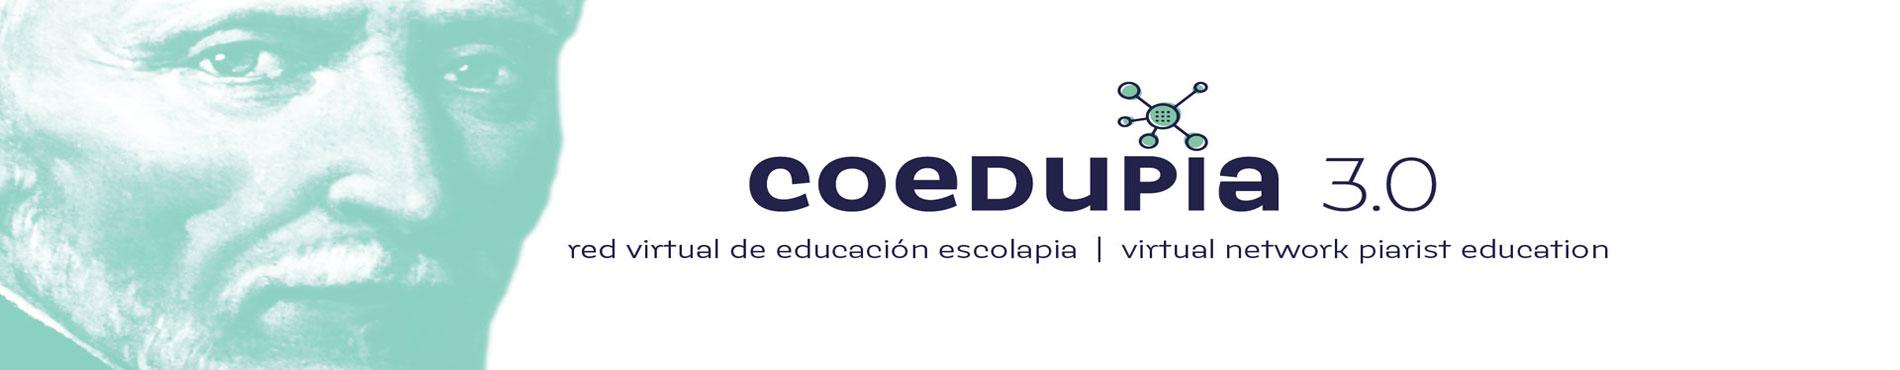 09-Coedupia 3.0